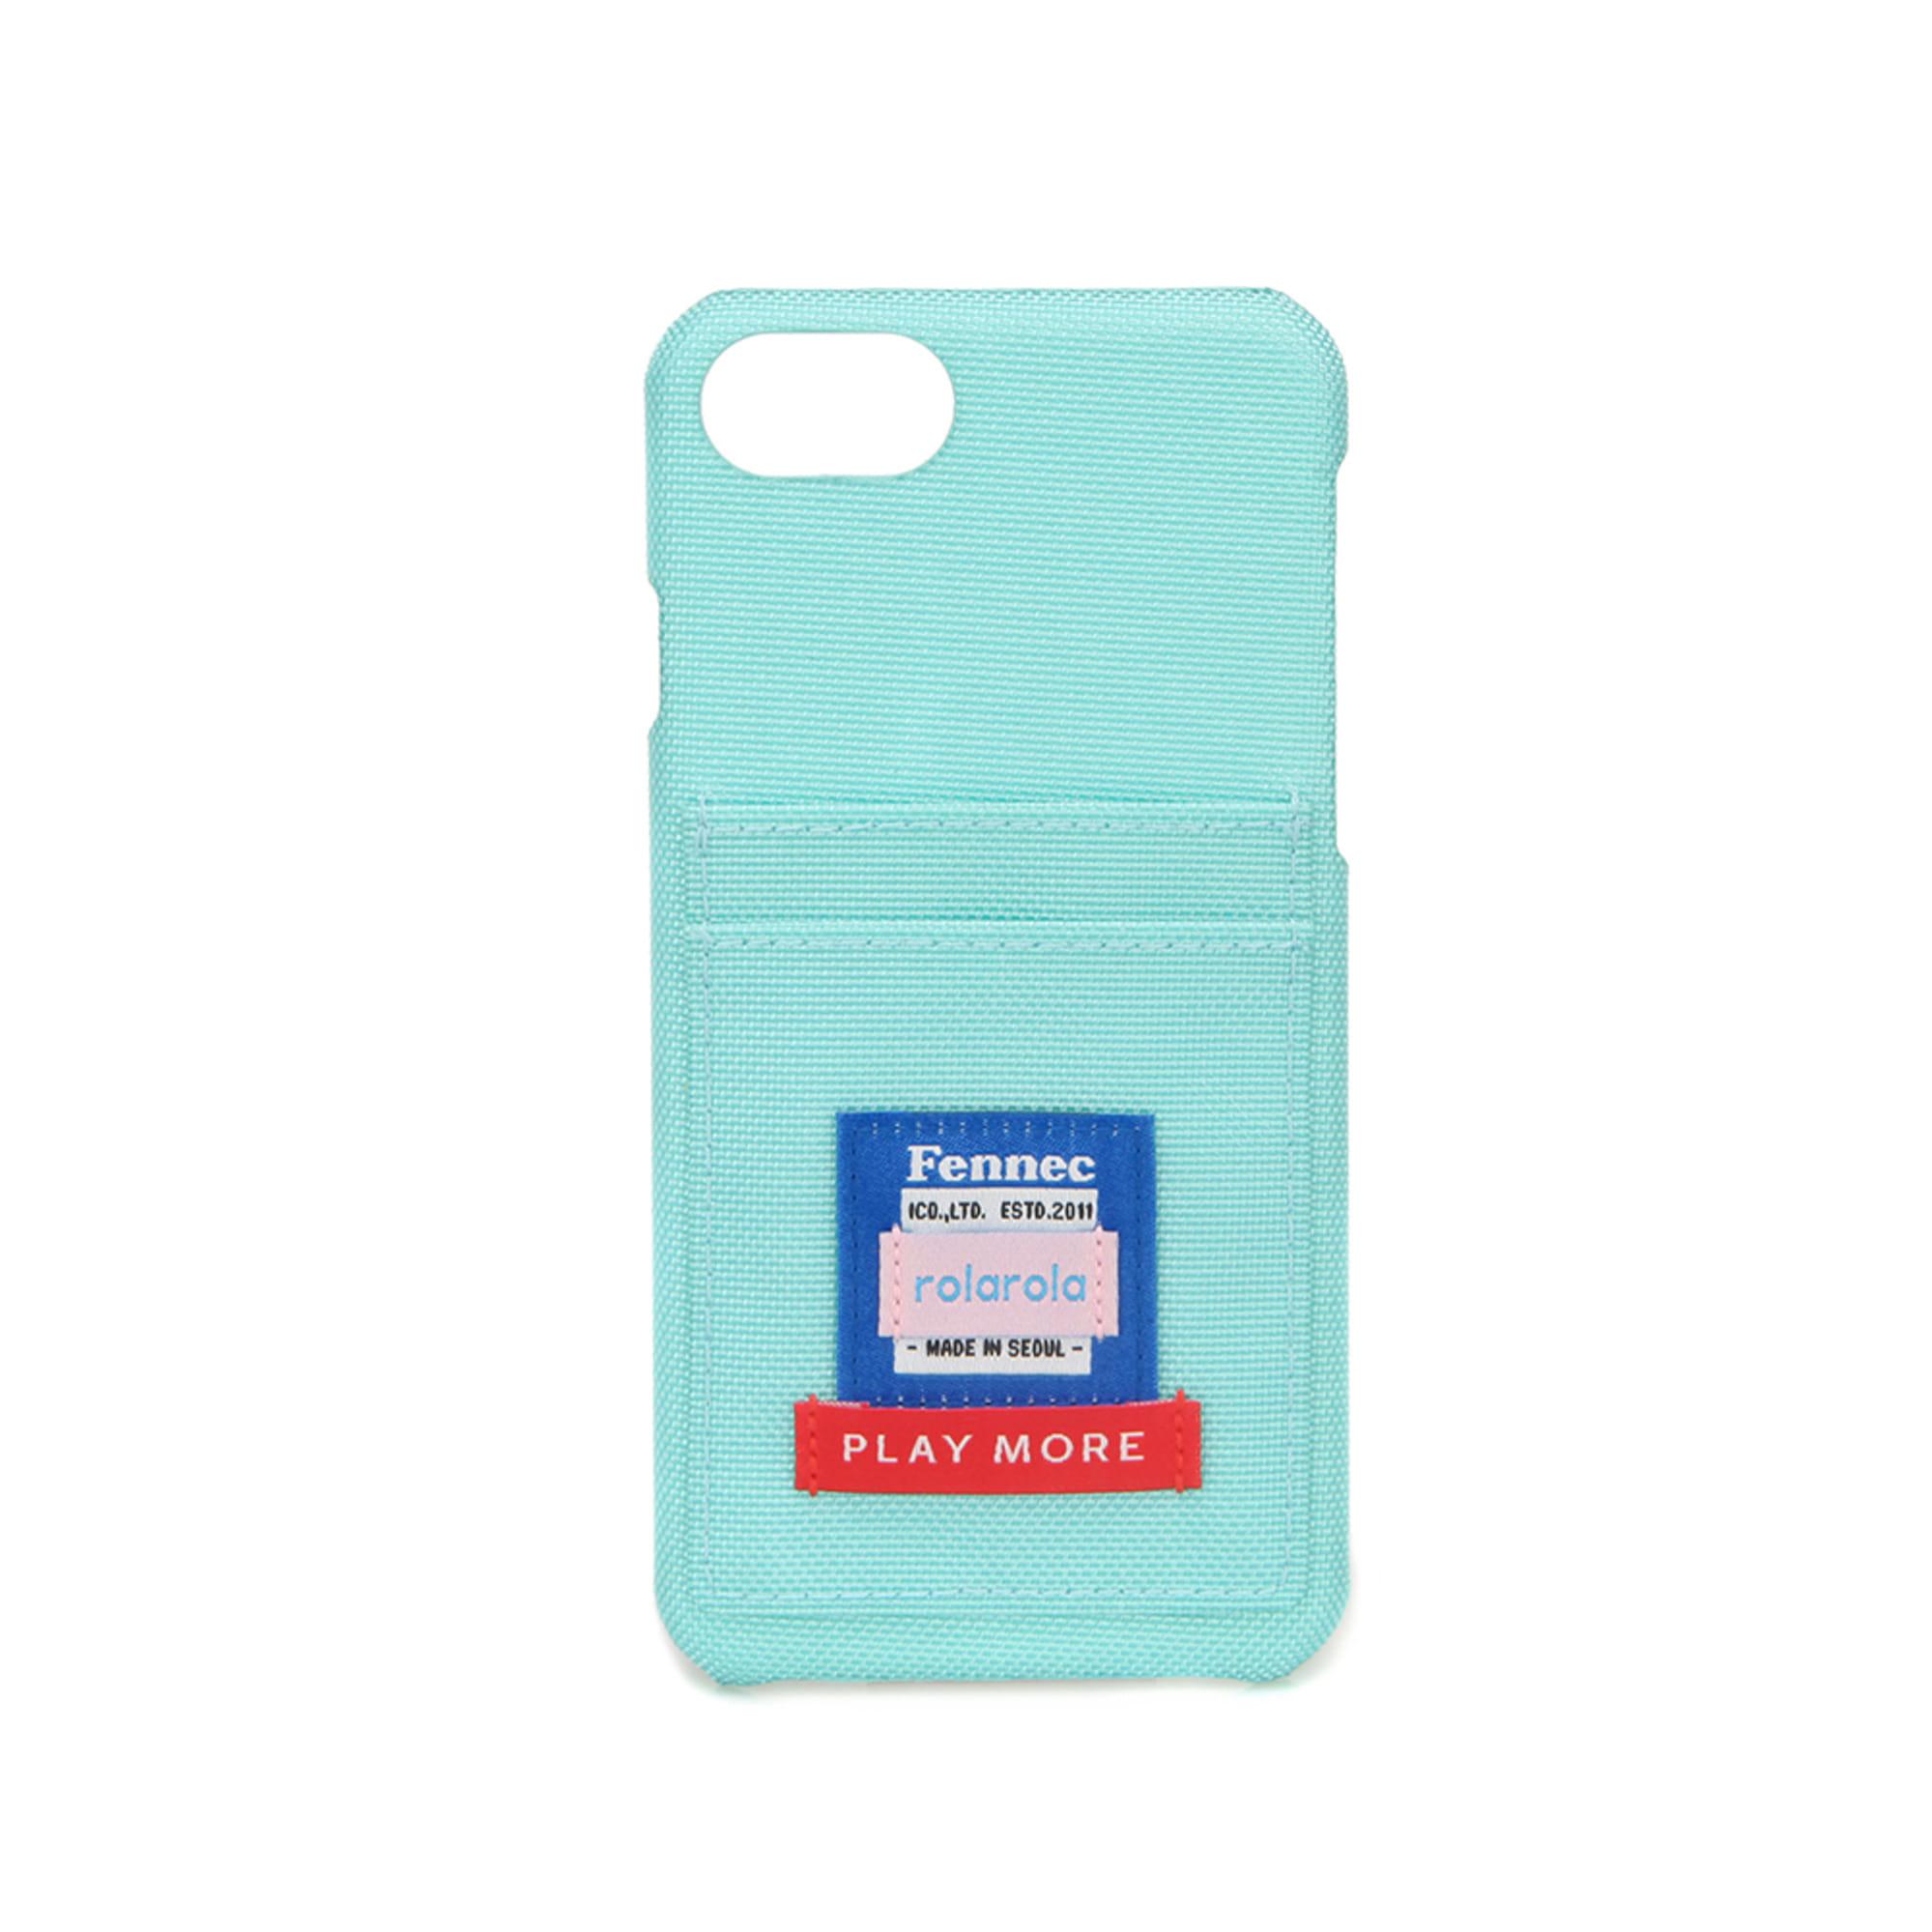 FENNEC X ROLAROLA IPHONE 7/8 CARD CASE - MINT